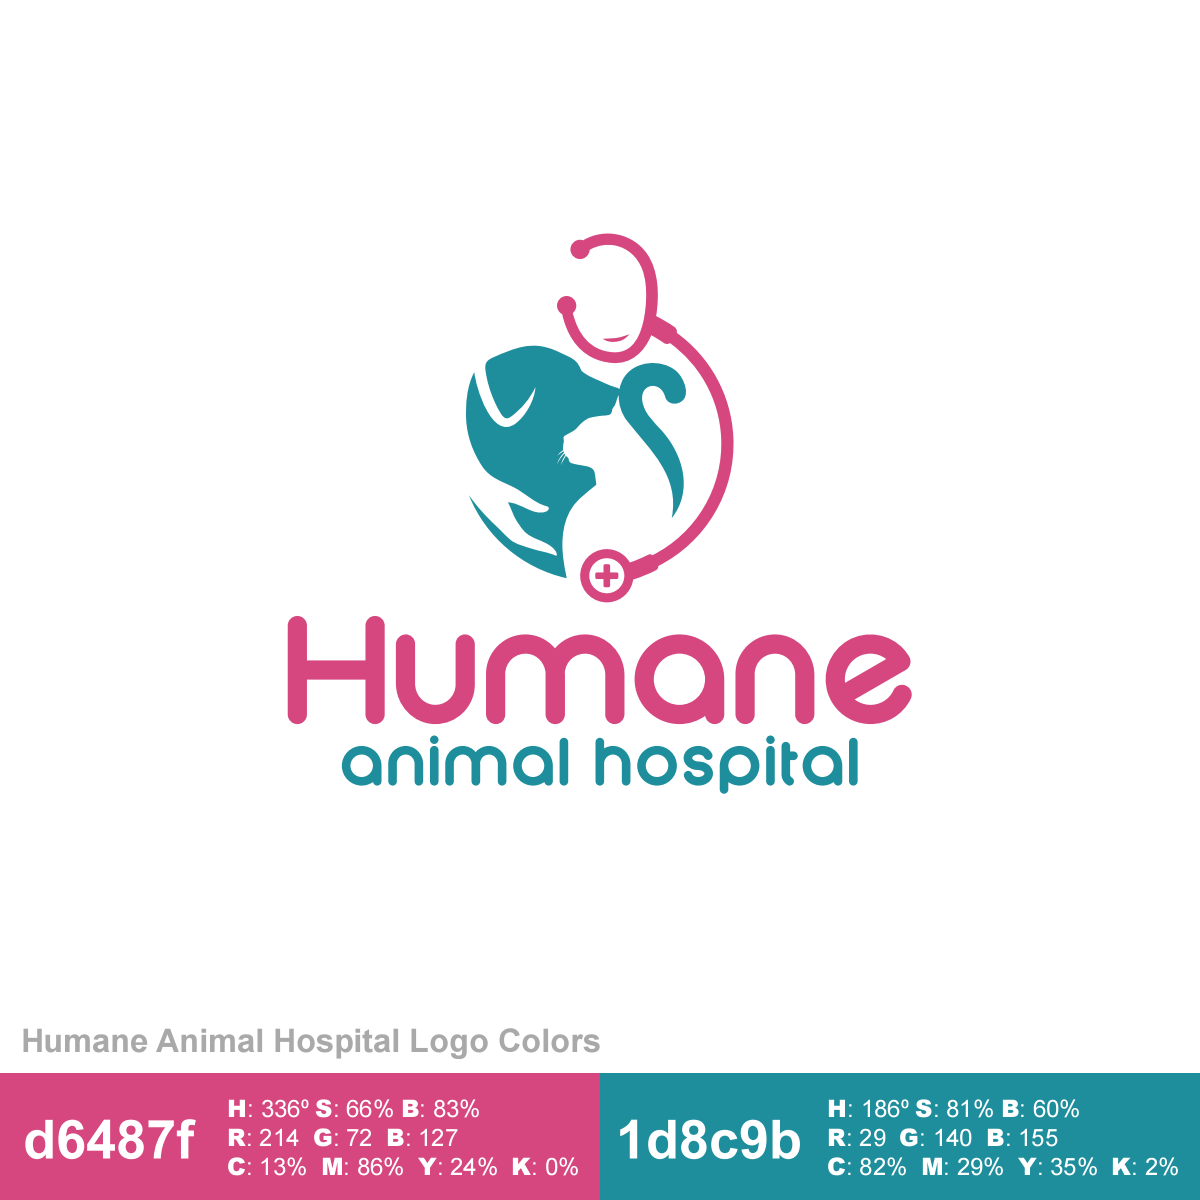 Humane Animal Hospital